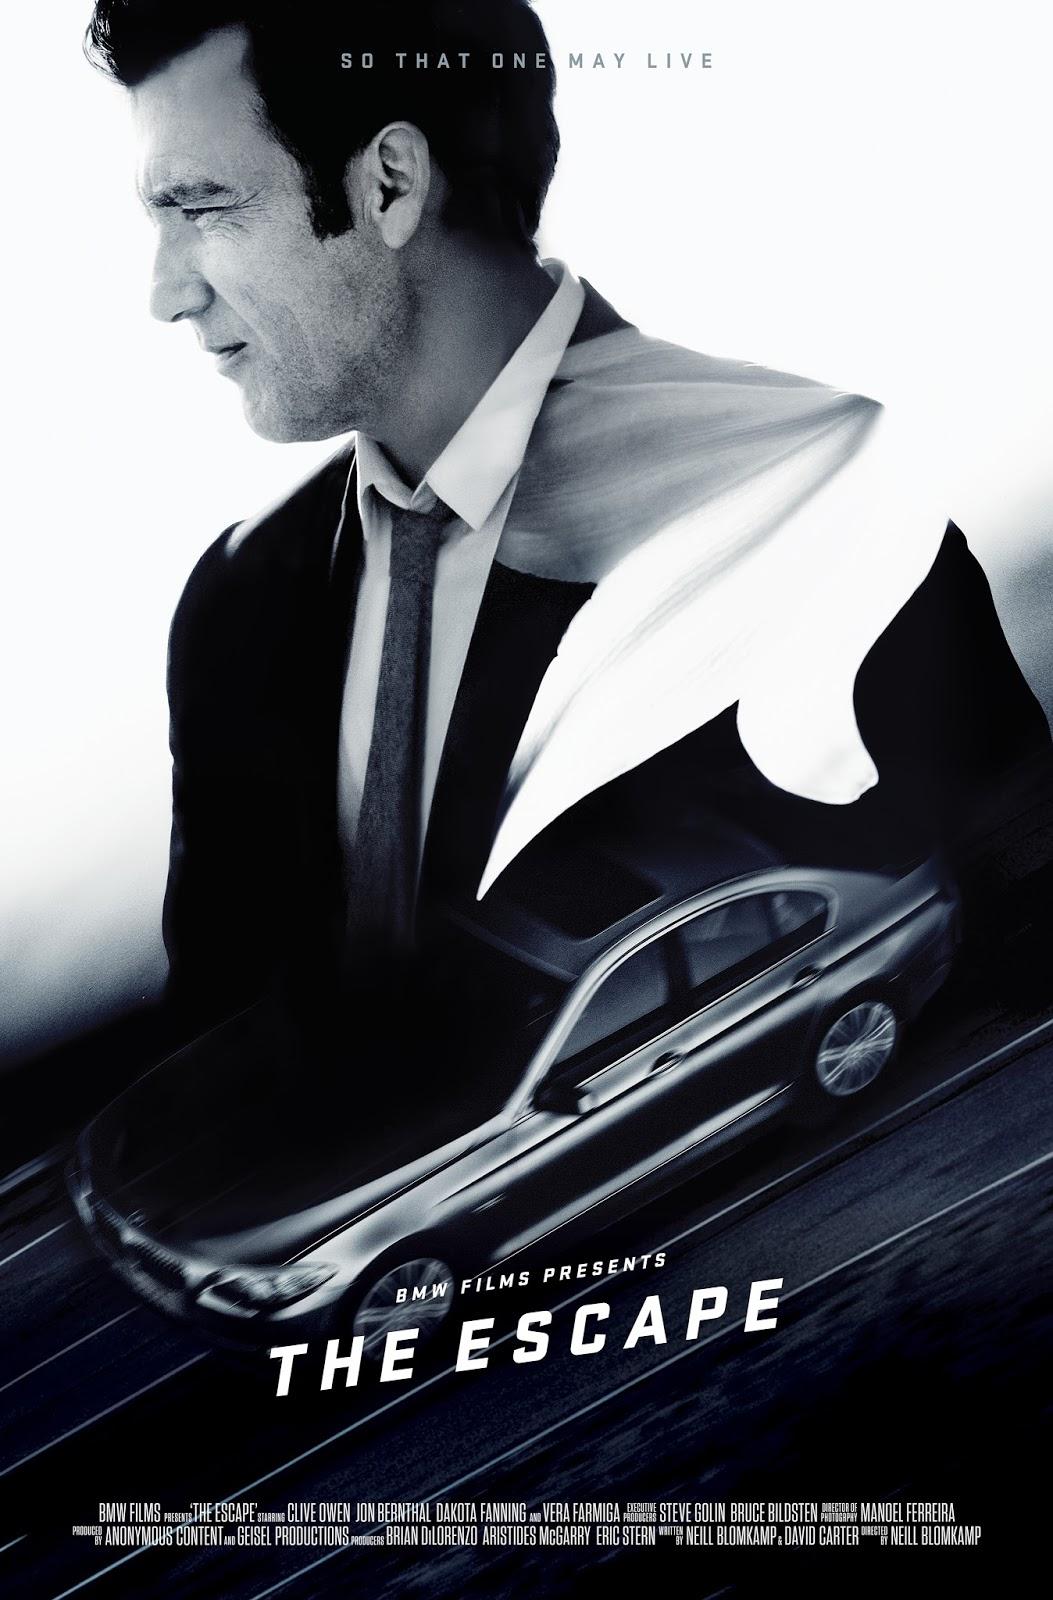 escape poster series1 Δες την ταινία The Escape, με πρωταγωνιστή την νέα BMW Σειρά 5 BMW, BMW 5, Fun, movie, movie cars, videos, Λανσάρισμα